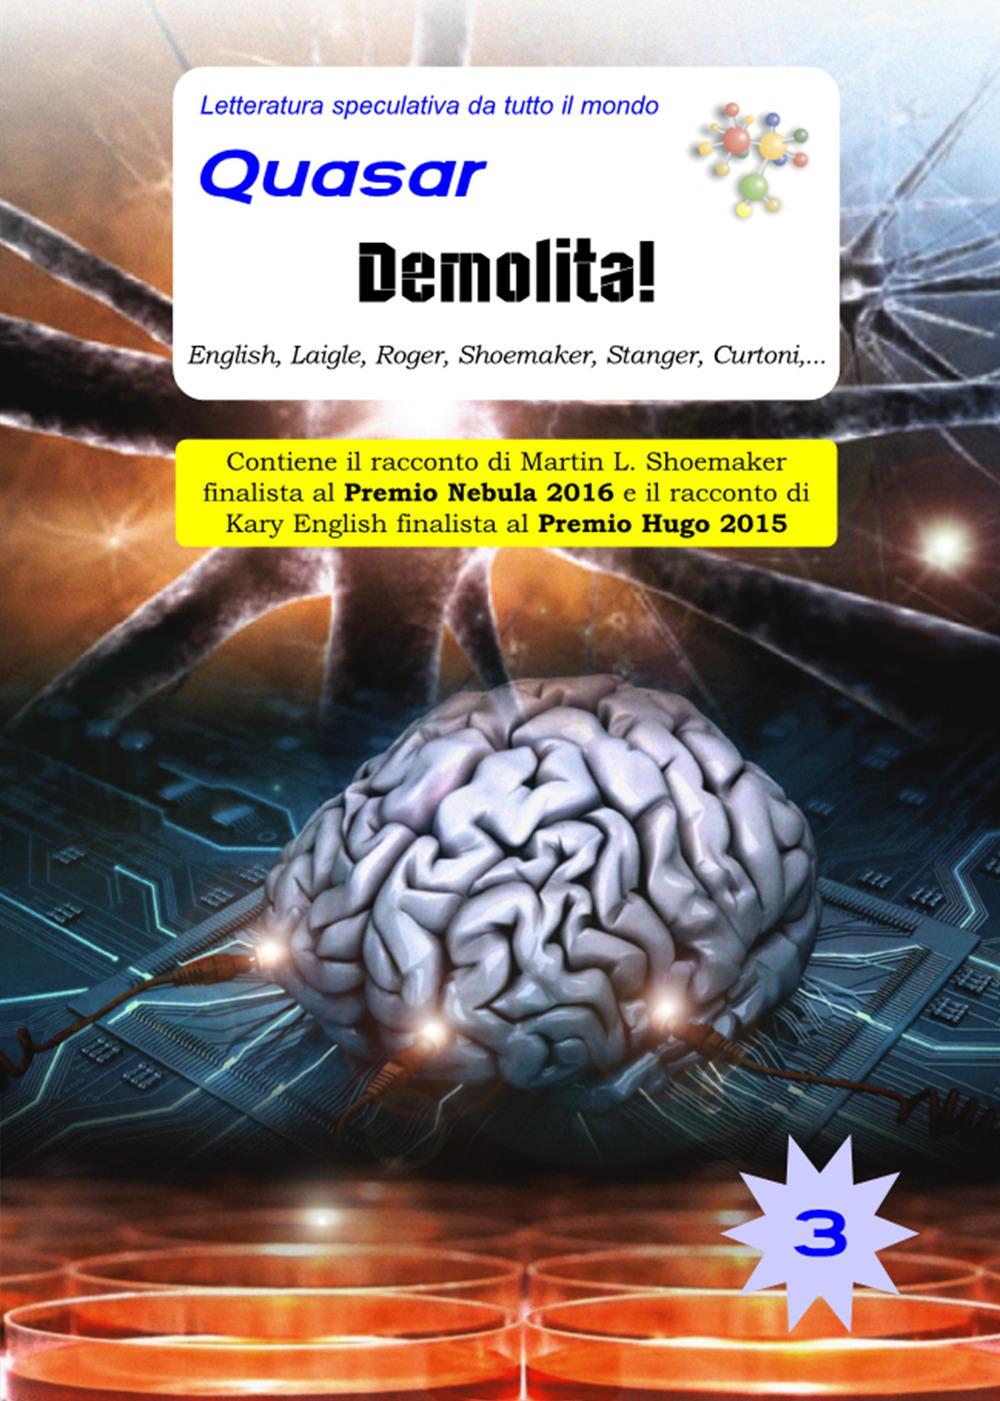 Quasar-Demolita